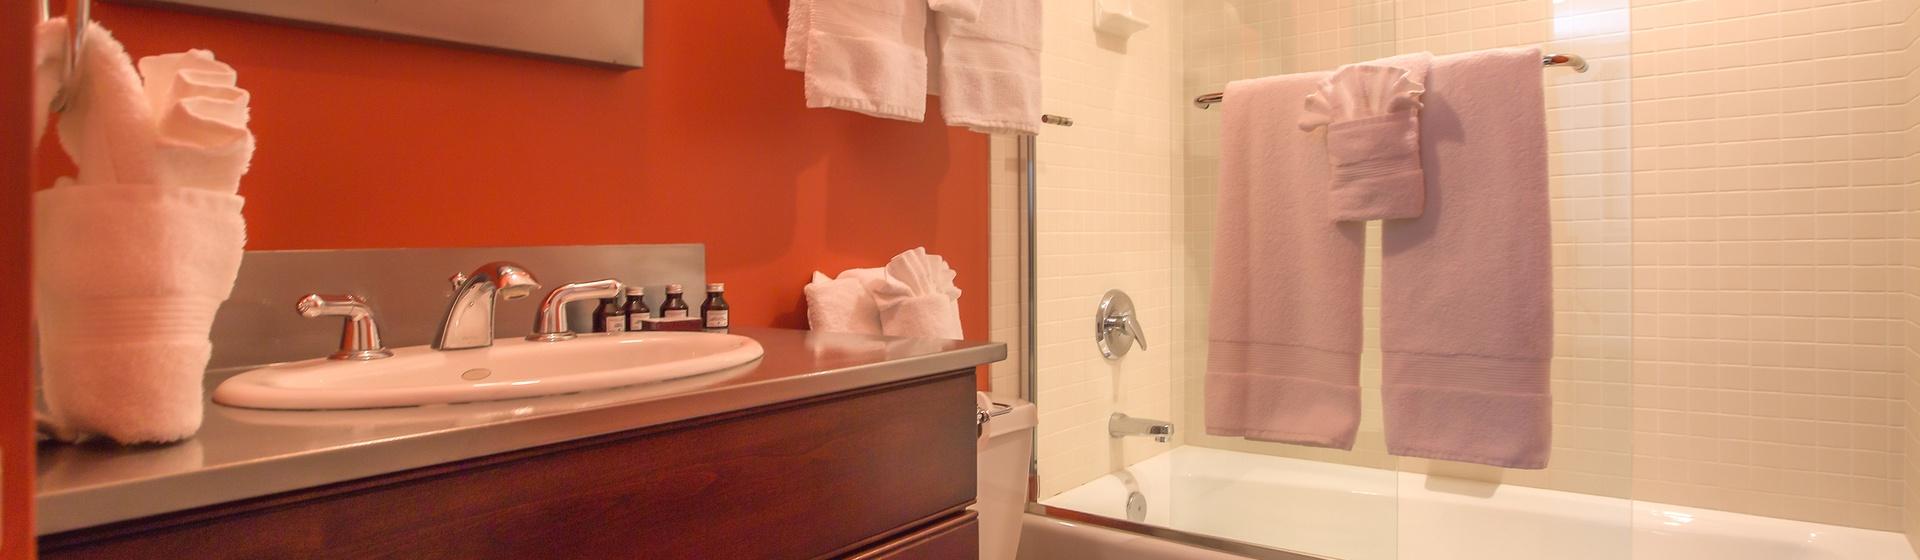 11-Telluride-Ajax-Guest-Bathroom-1-Web-Web.jpg